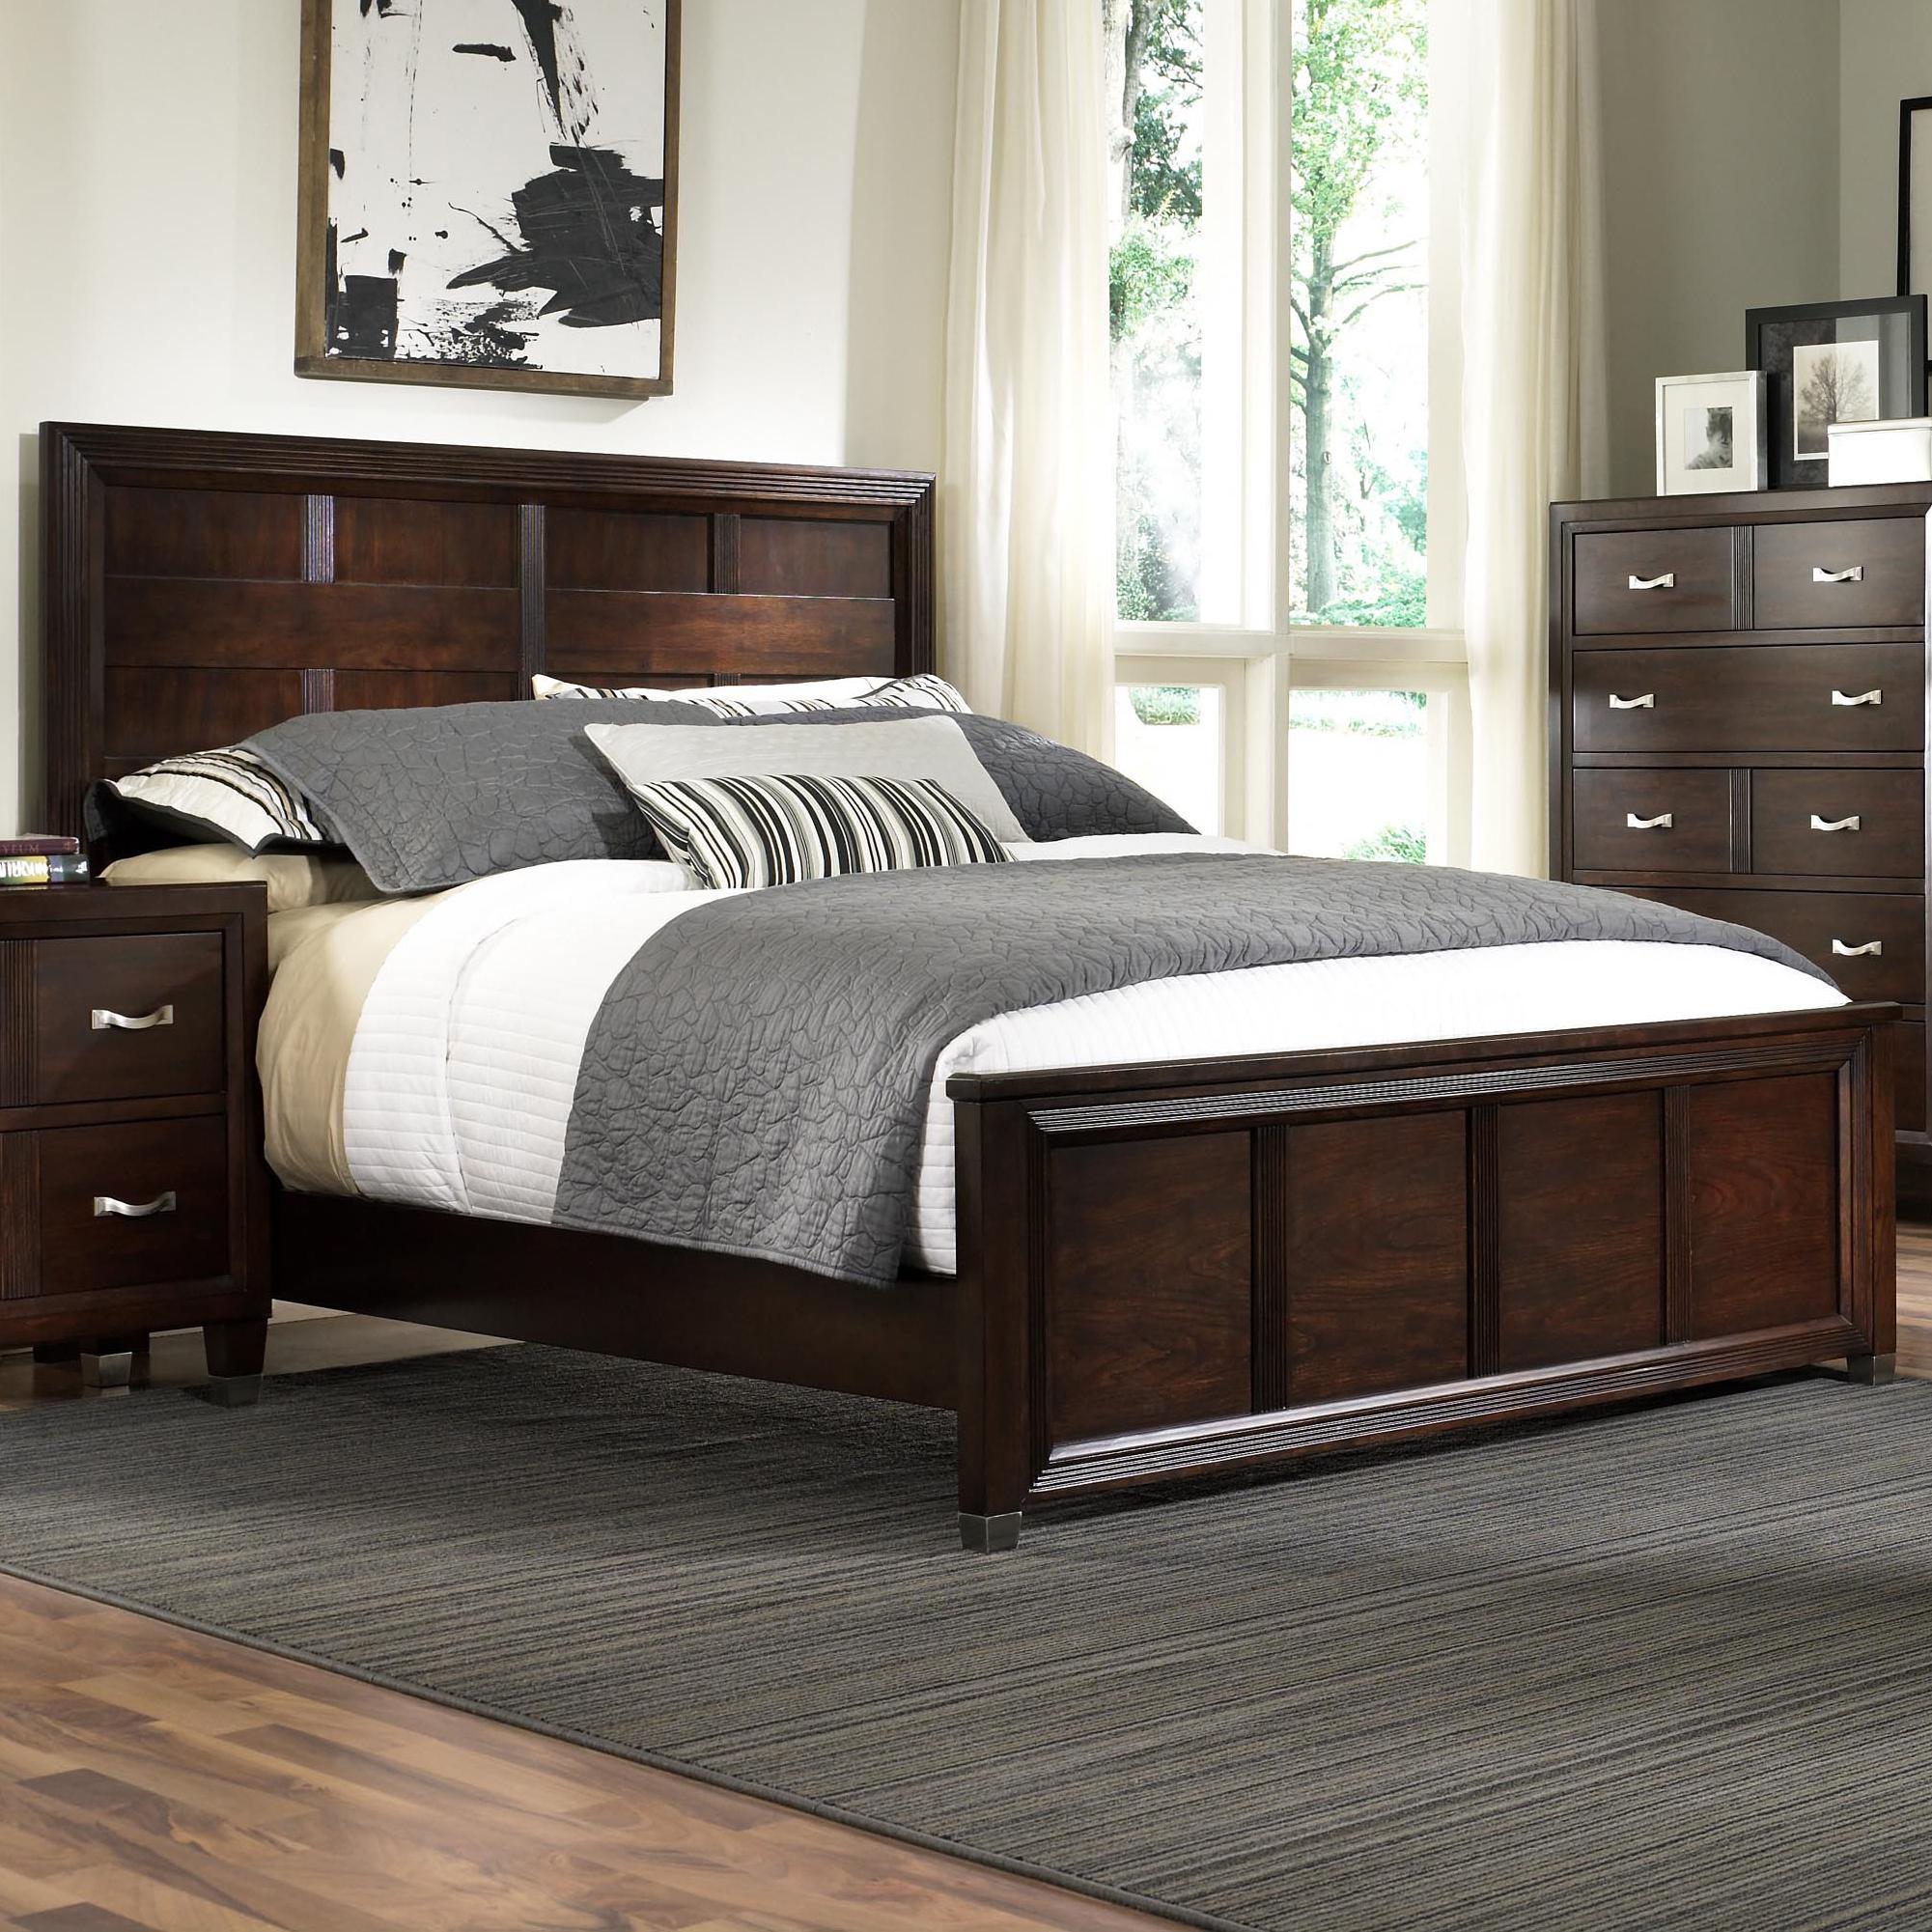 broyhill furniture eastlake 2 king panel headboard and low profile footboard bed lindy 39 s. Black Bedroom Furniture Sets. Home Design Ideas